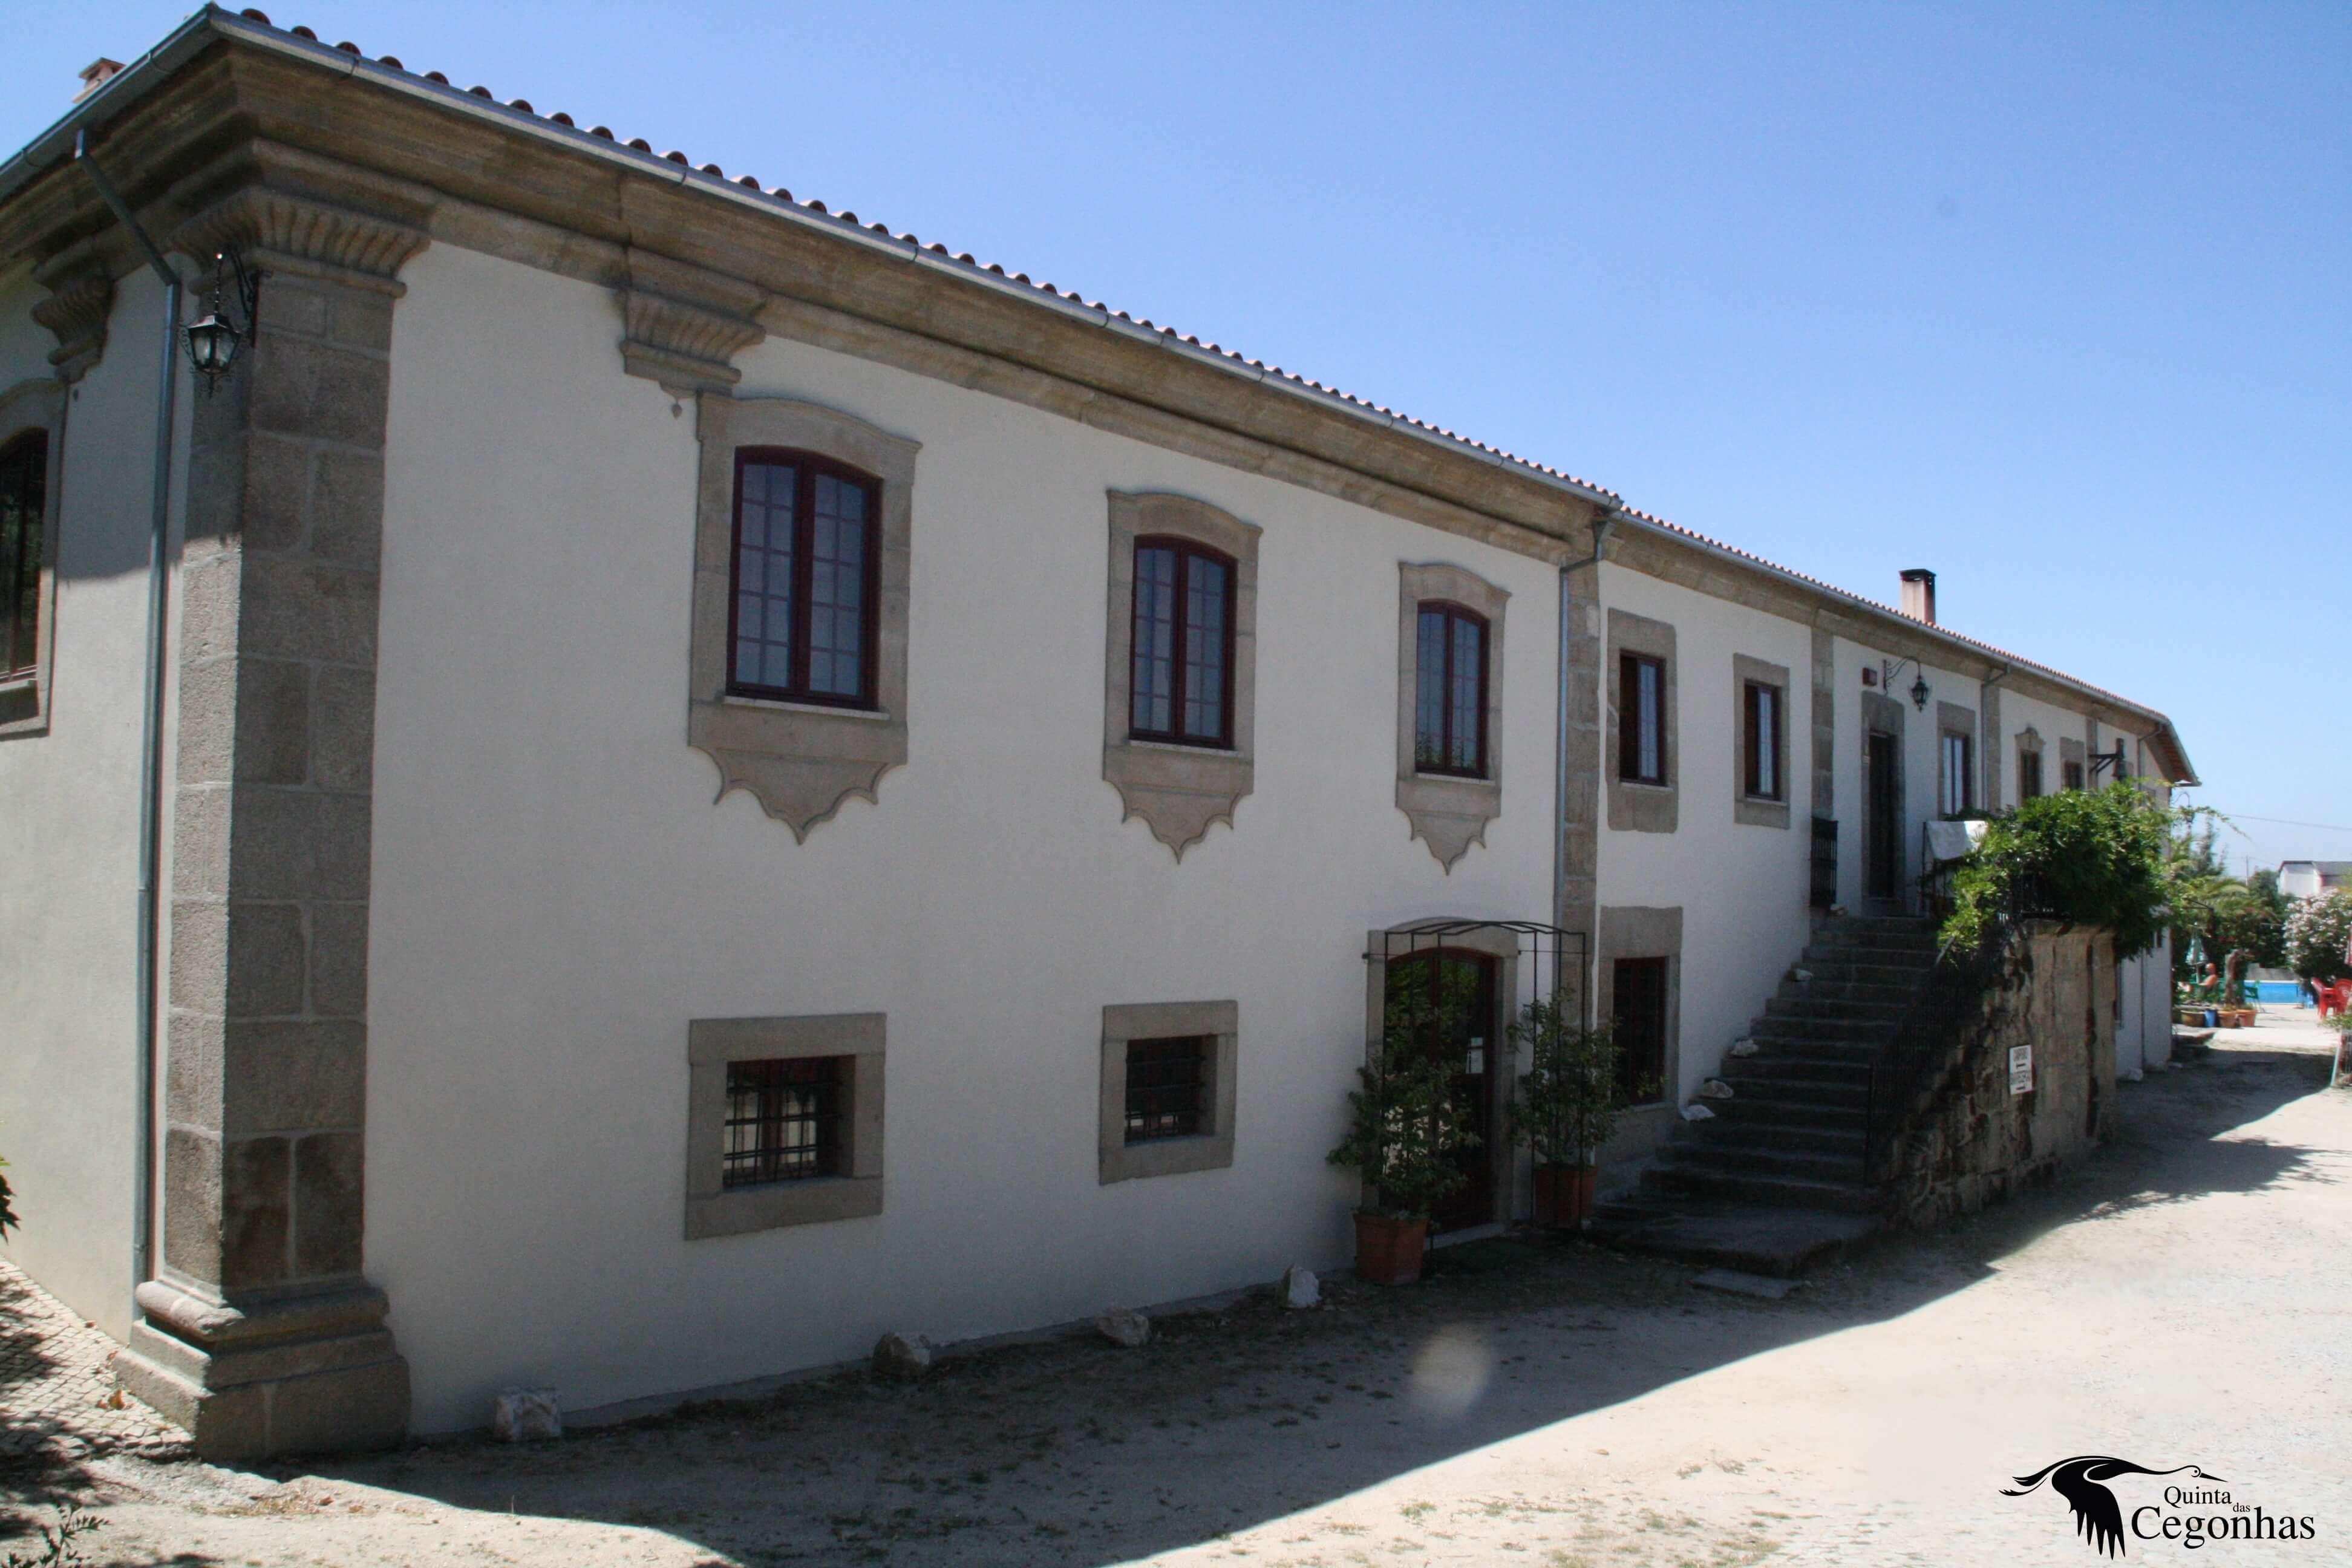 Quinta da Cegonhas